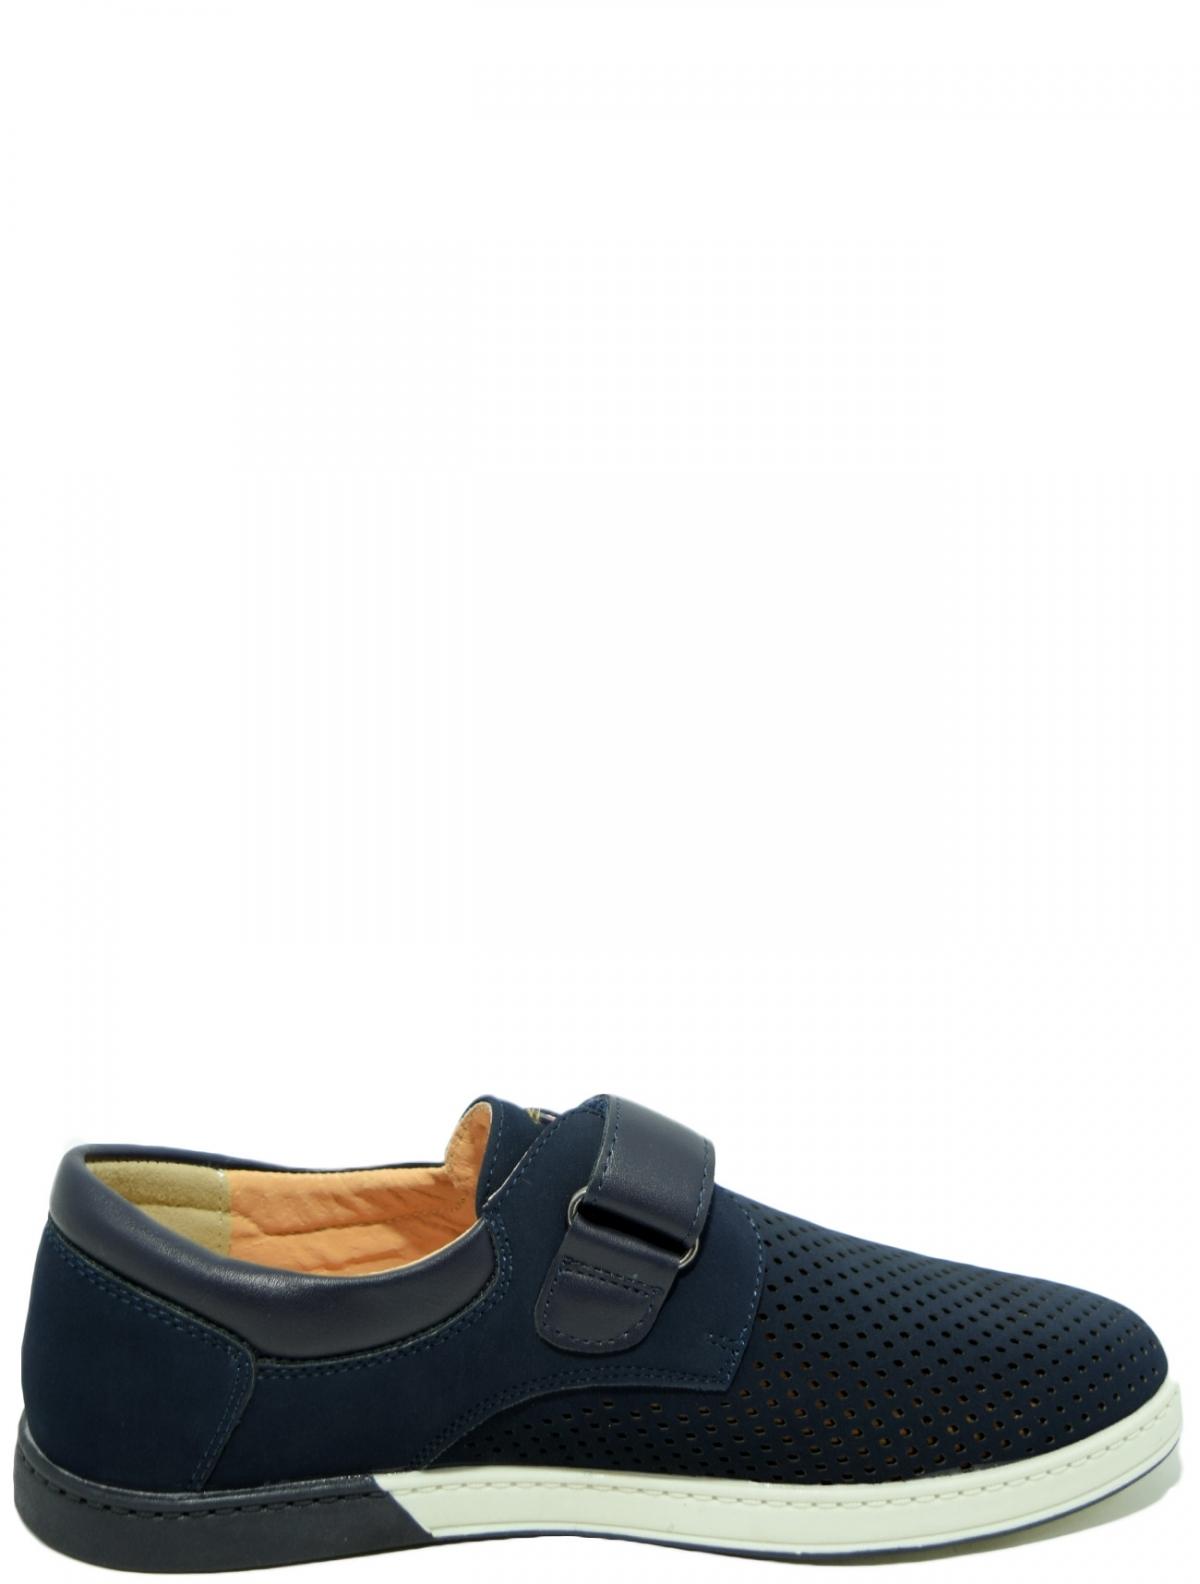 Ulet TD229-26A туфли для мальчика